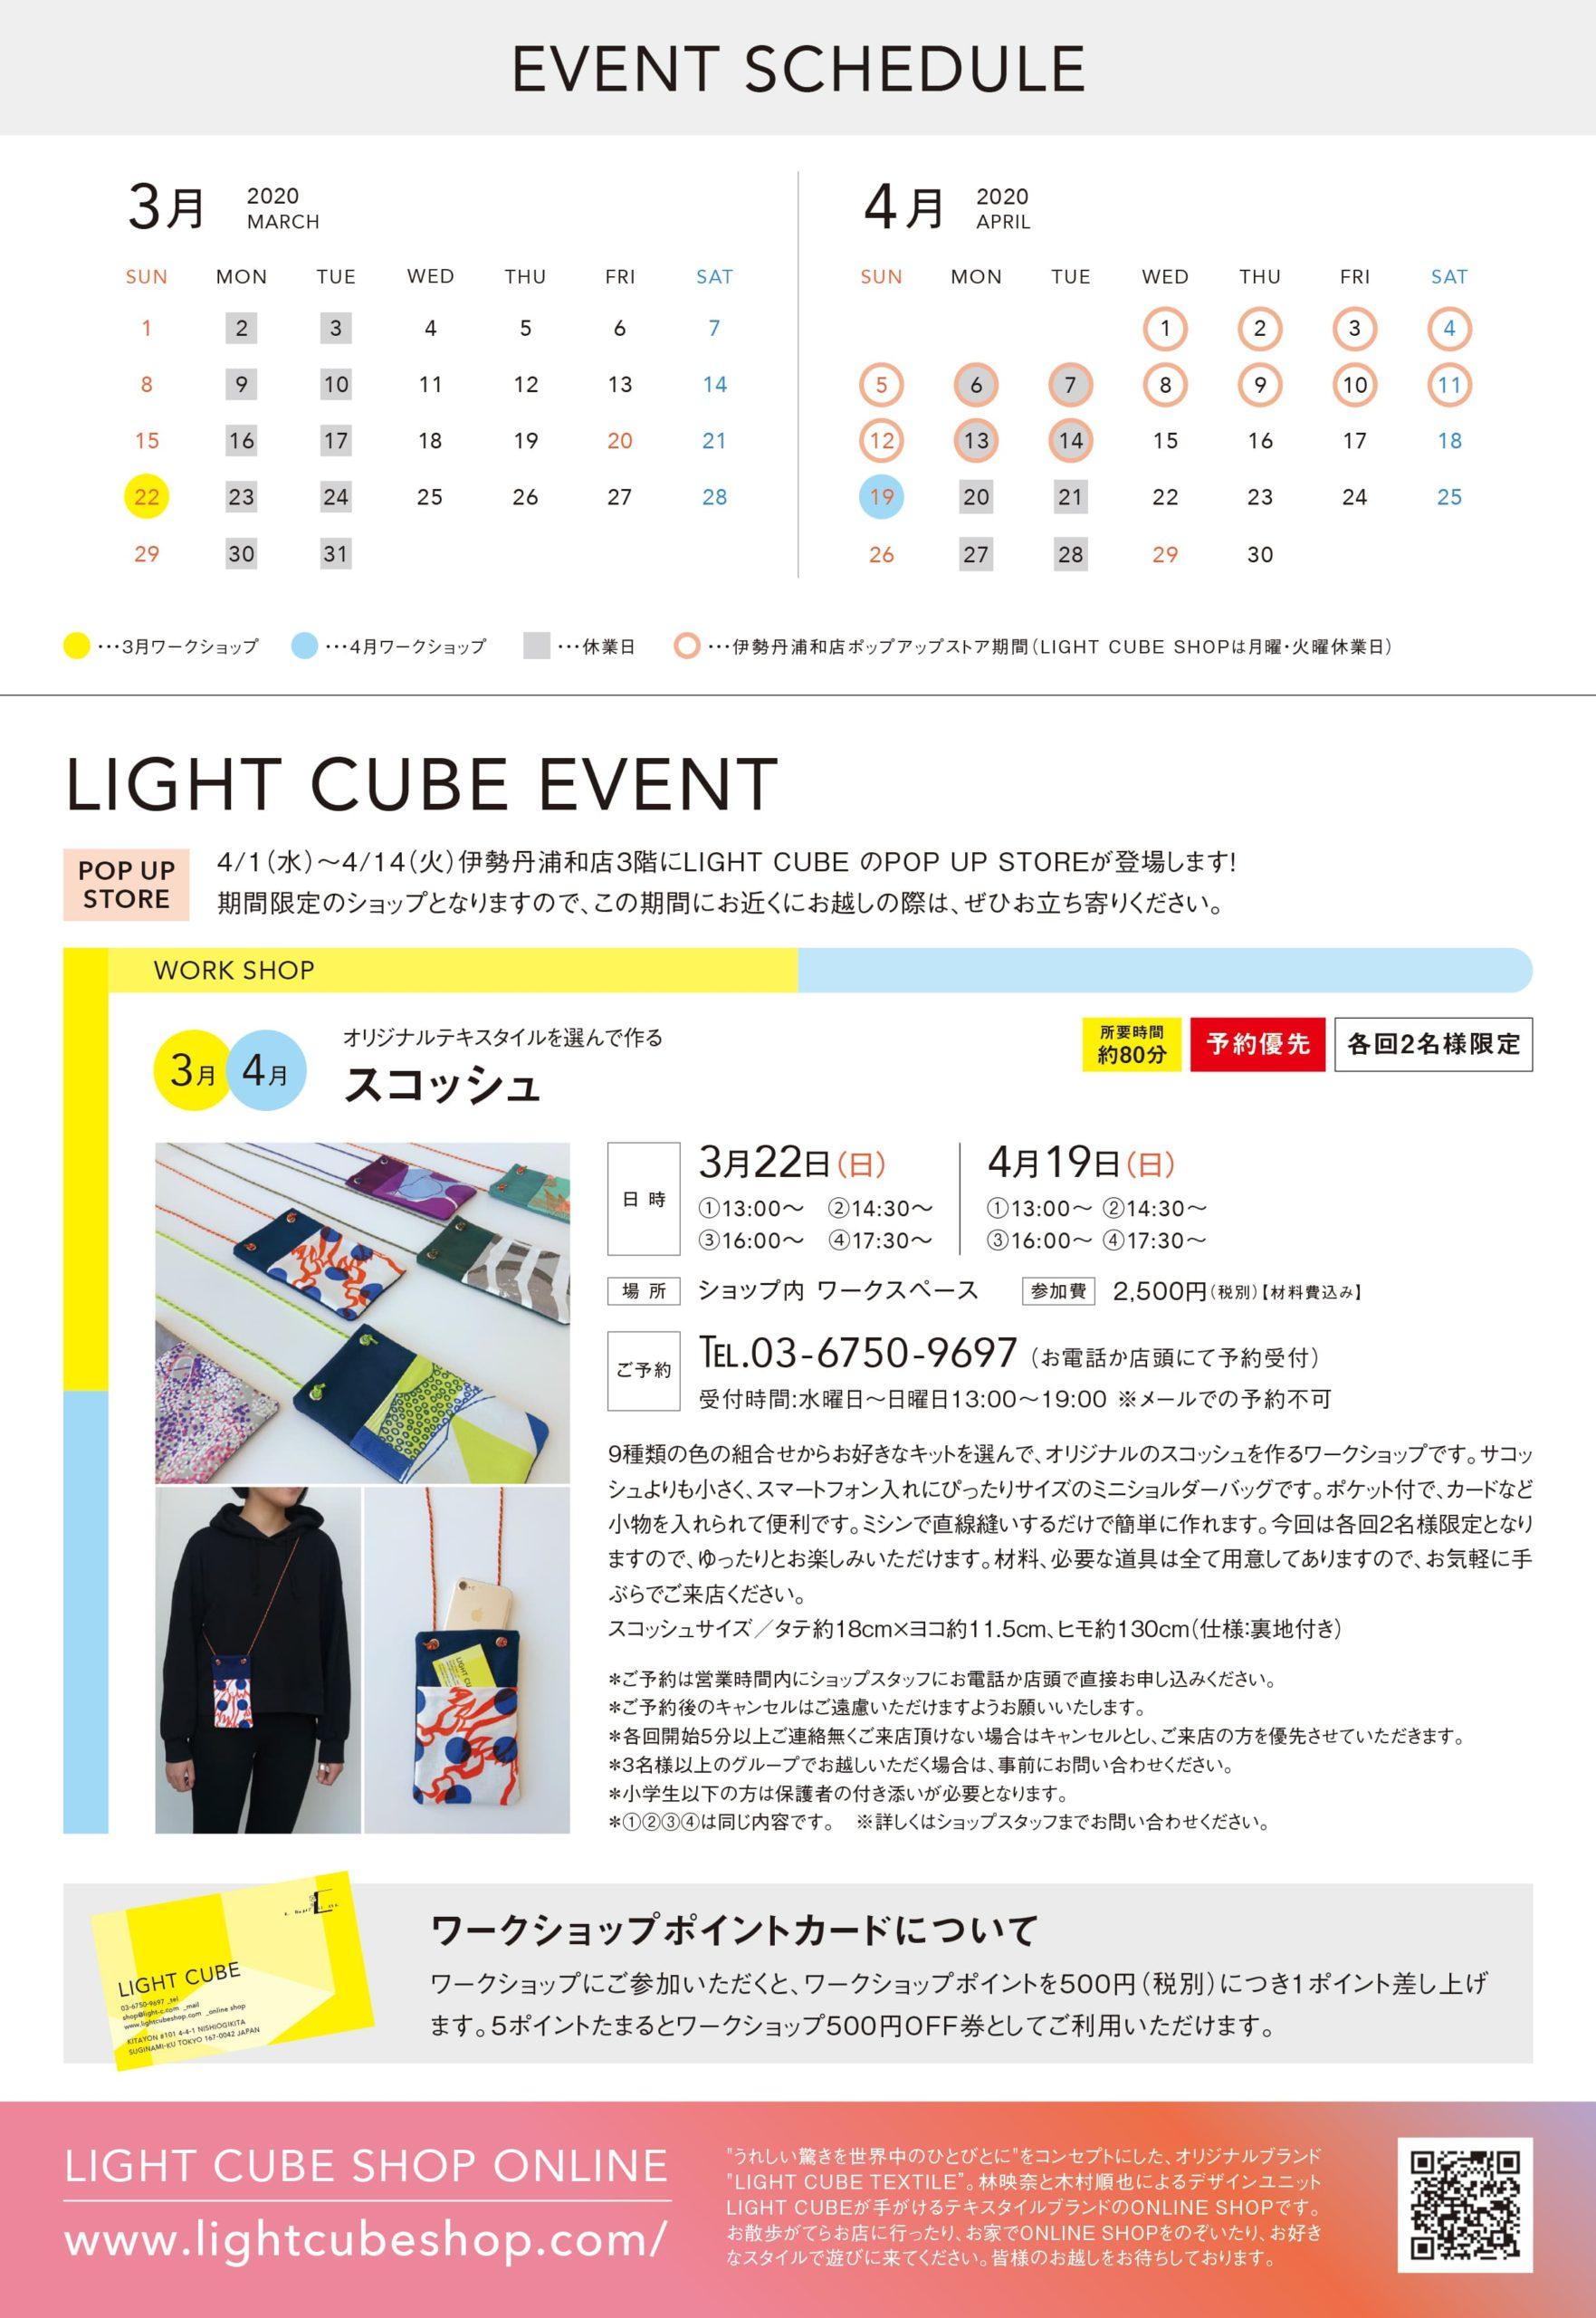 LIGHT CUBE EVENT SCHEDULE